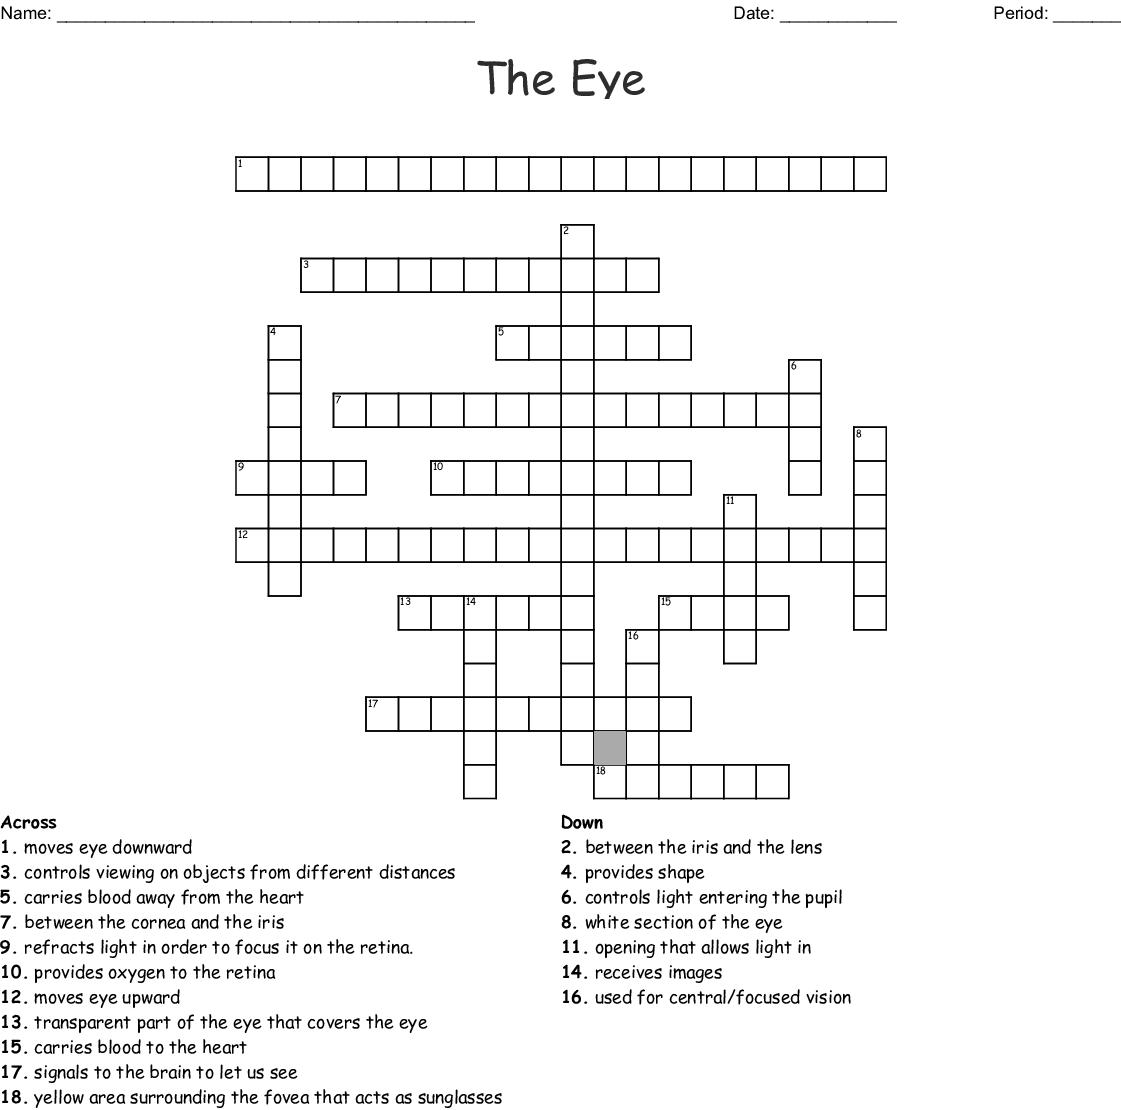 The Eye Vocabulary Crossword